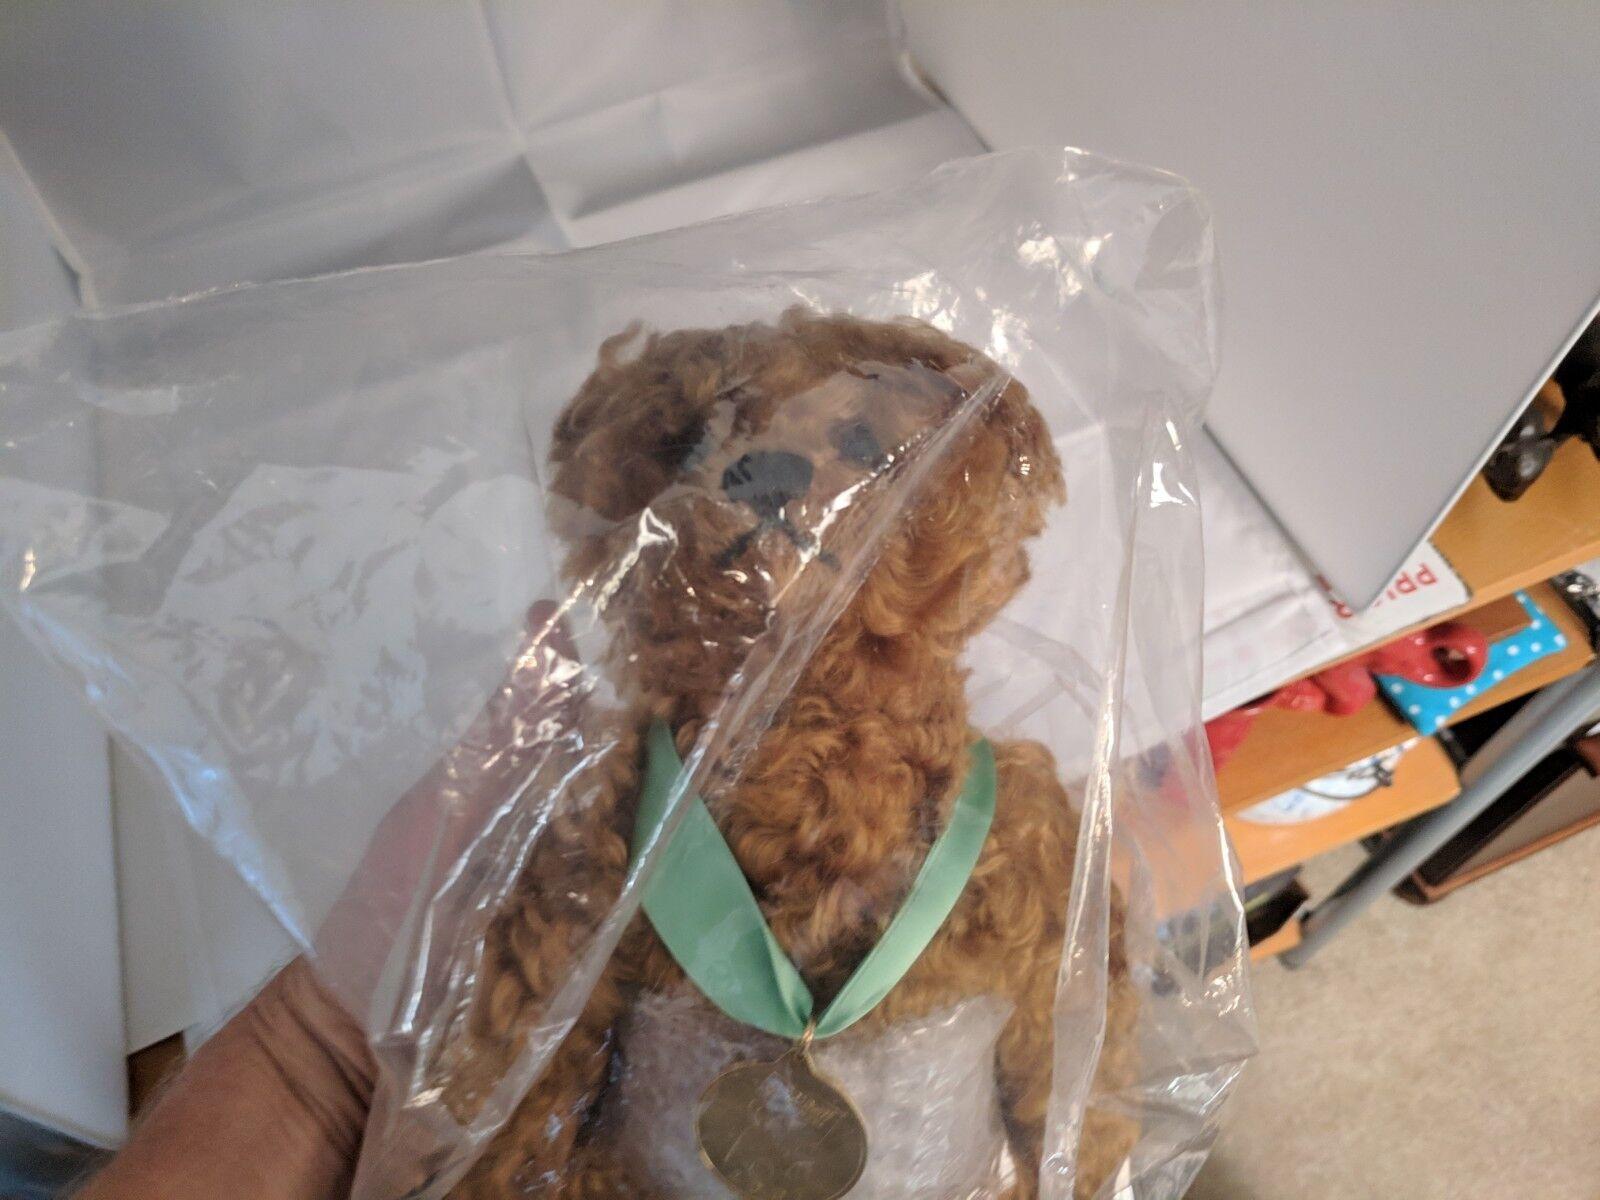 Steiff 2007 Classic Jointed Teddy Bear, Marronee-669521 Still Sealed in Bag